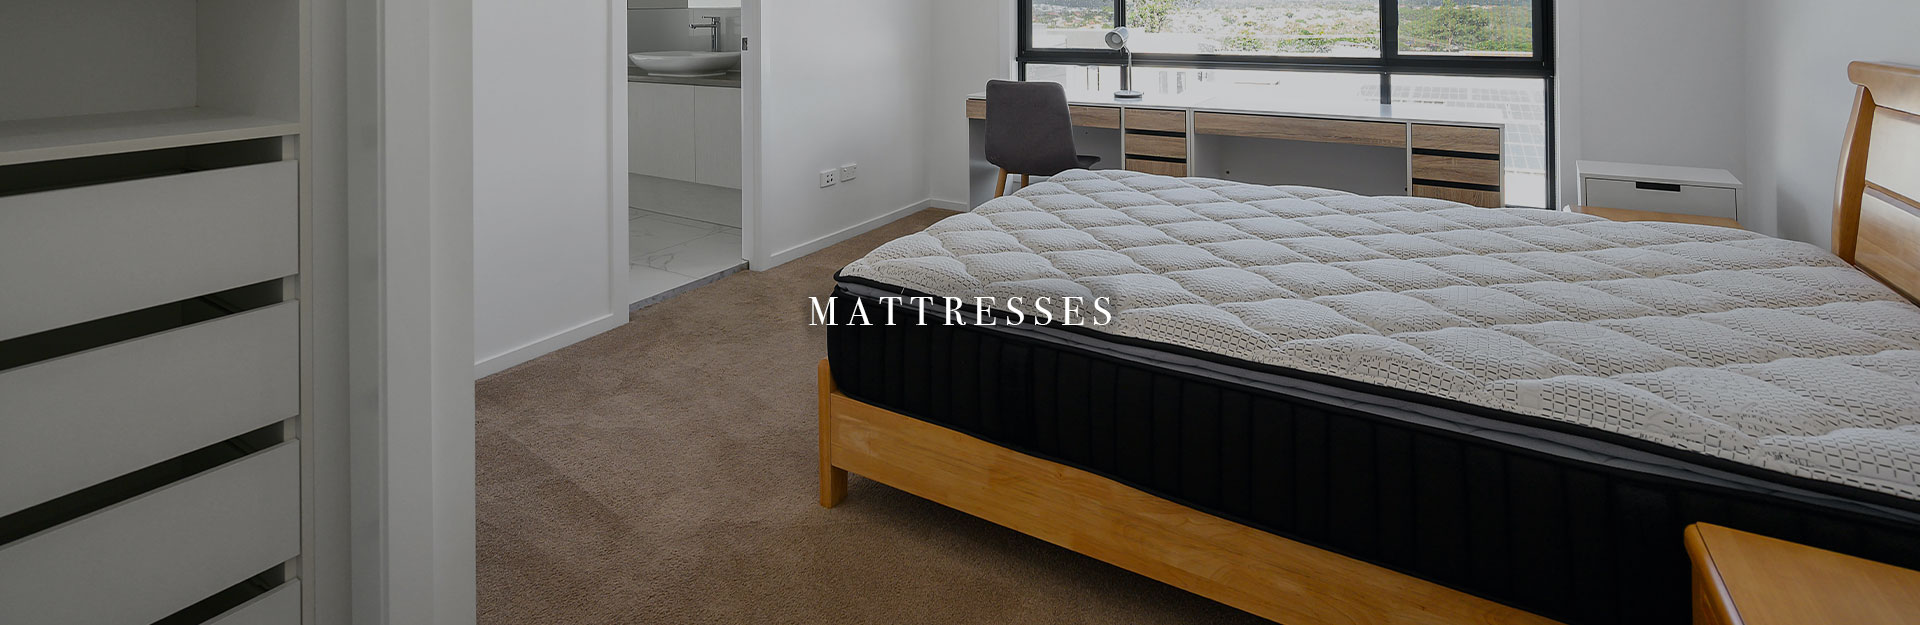 abh-mattresses-.jpg